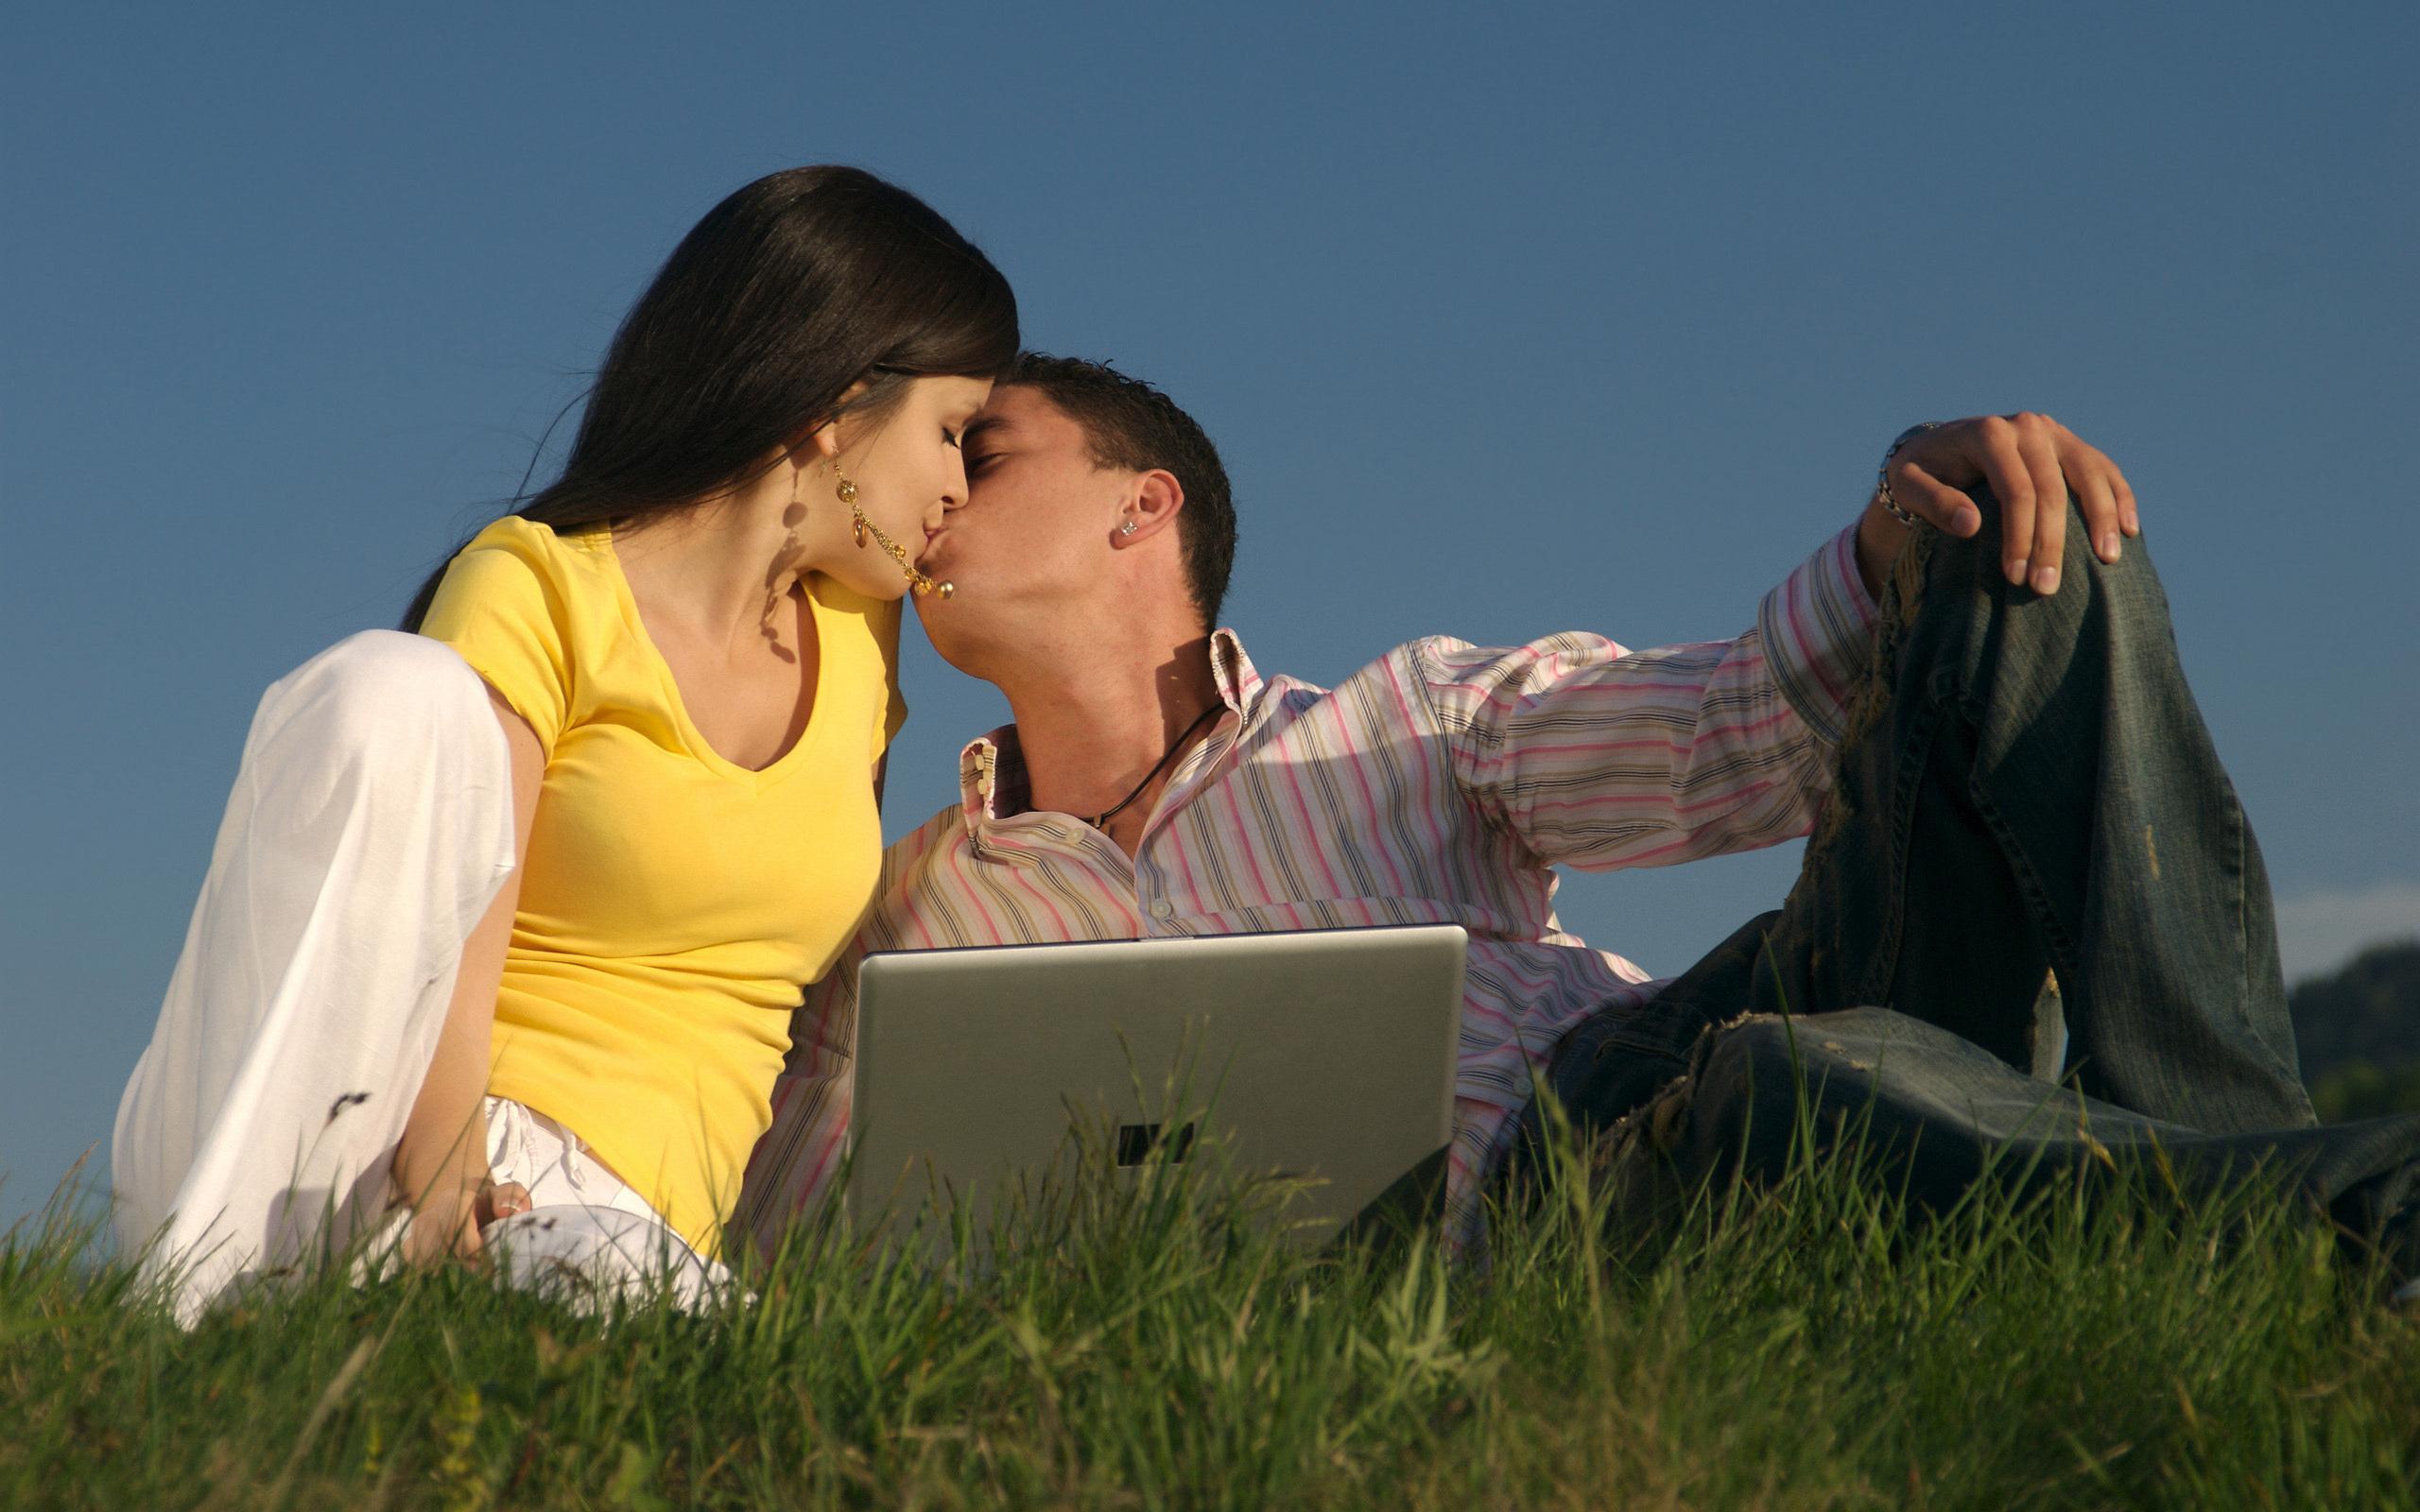 Seznmen pes internet? Dobr npad, ale muste se dret